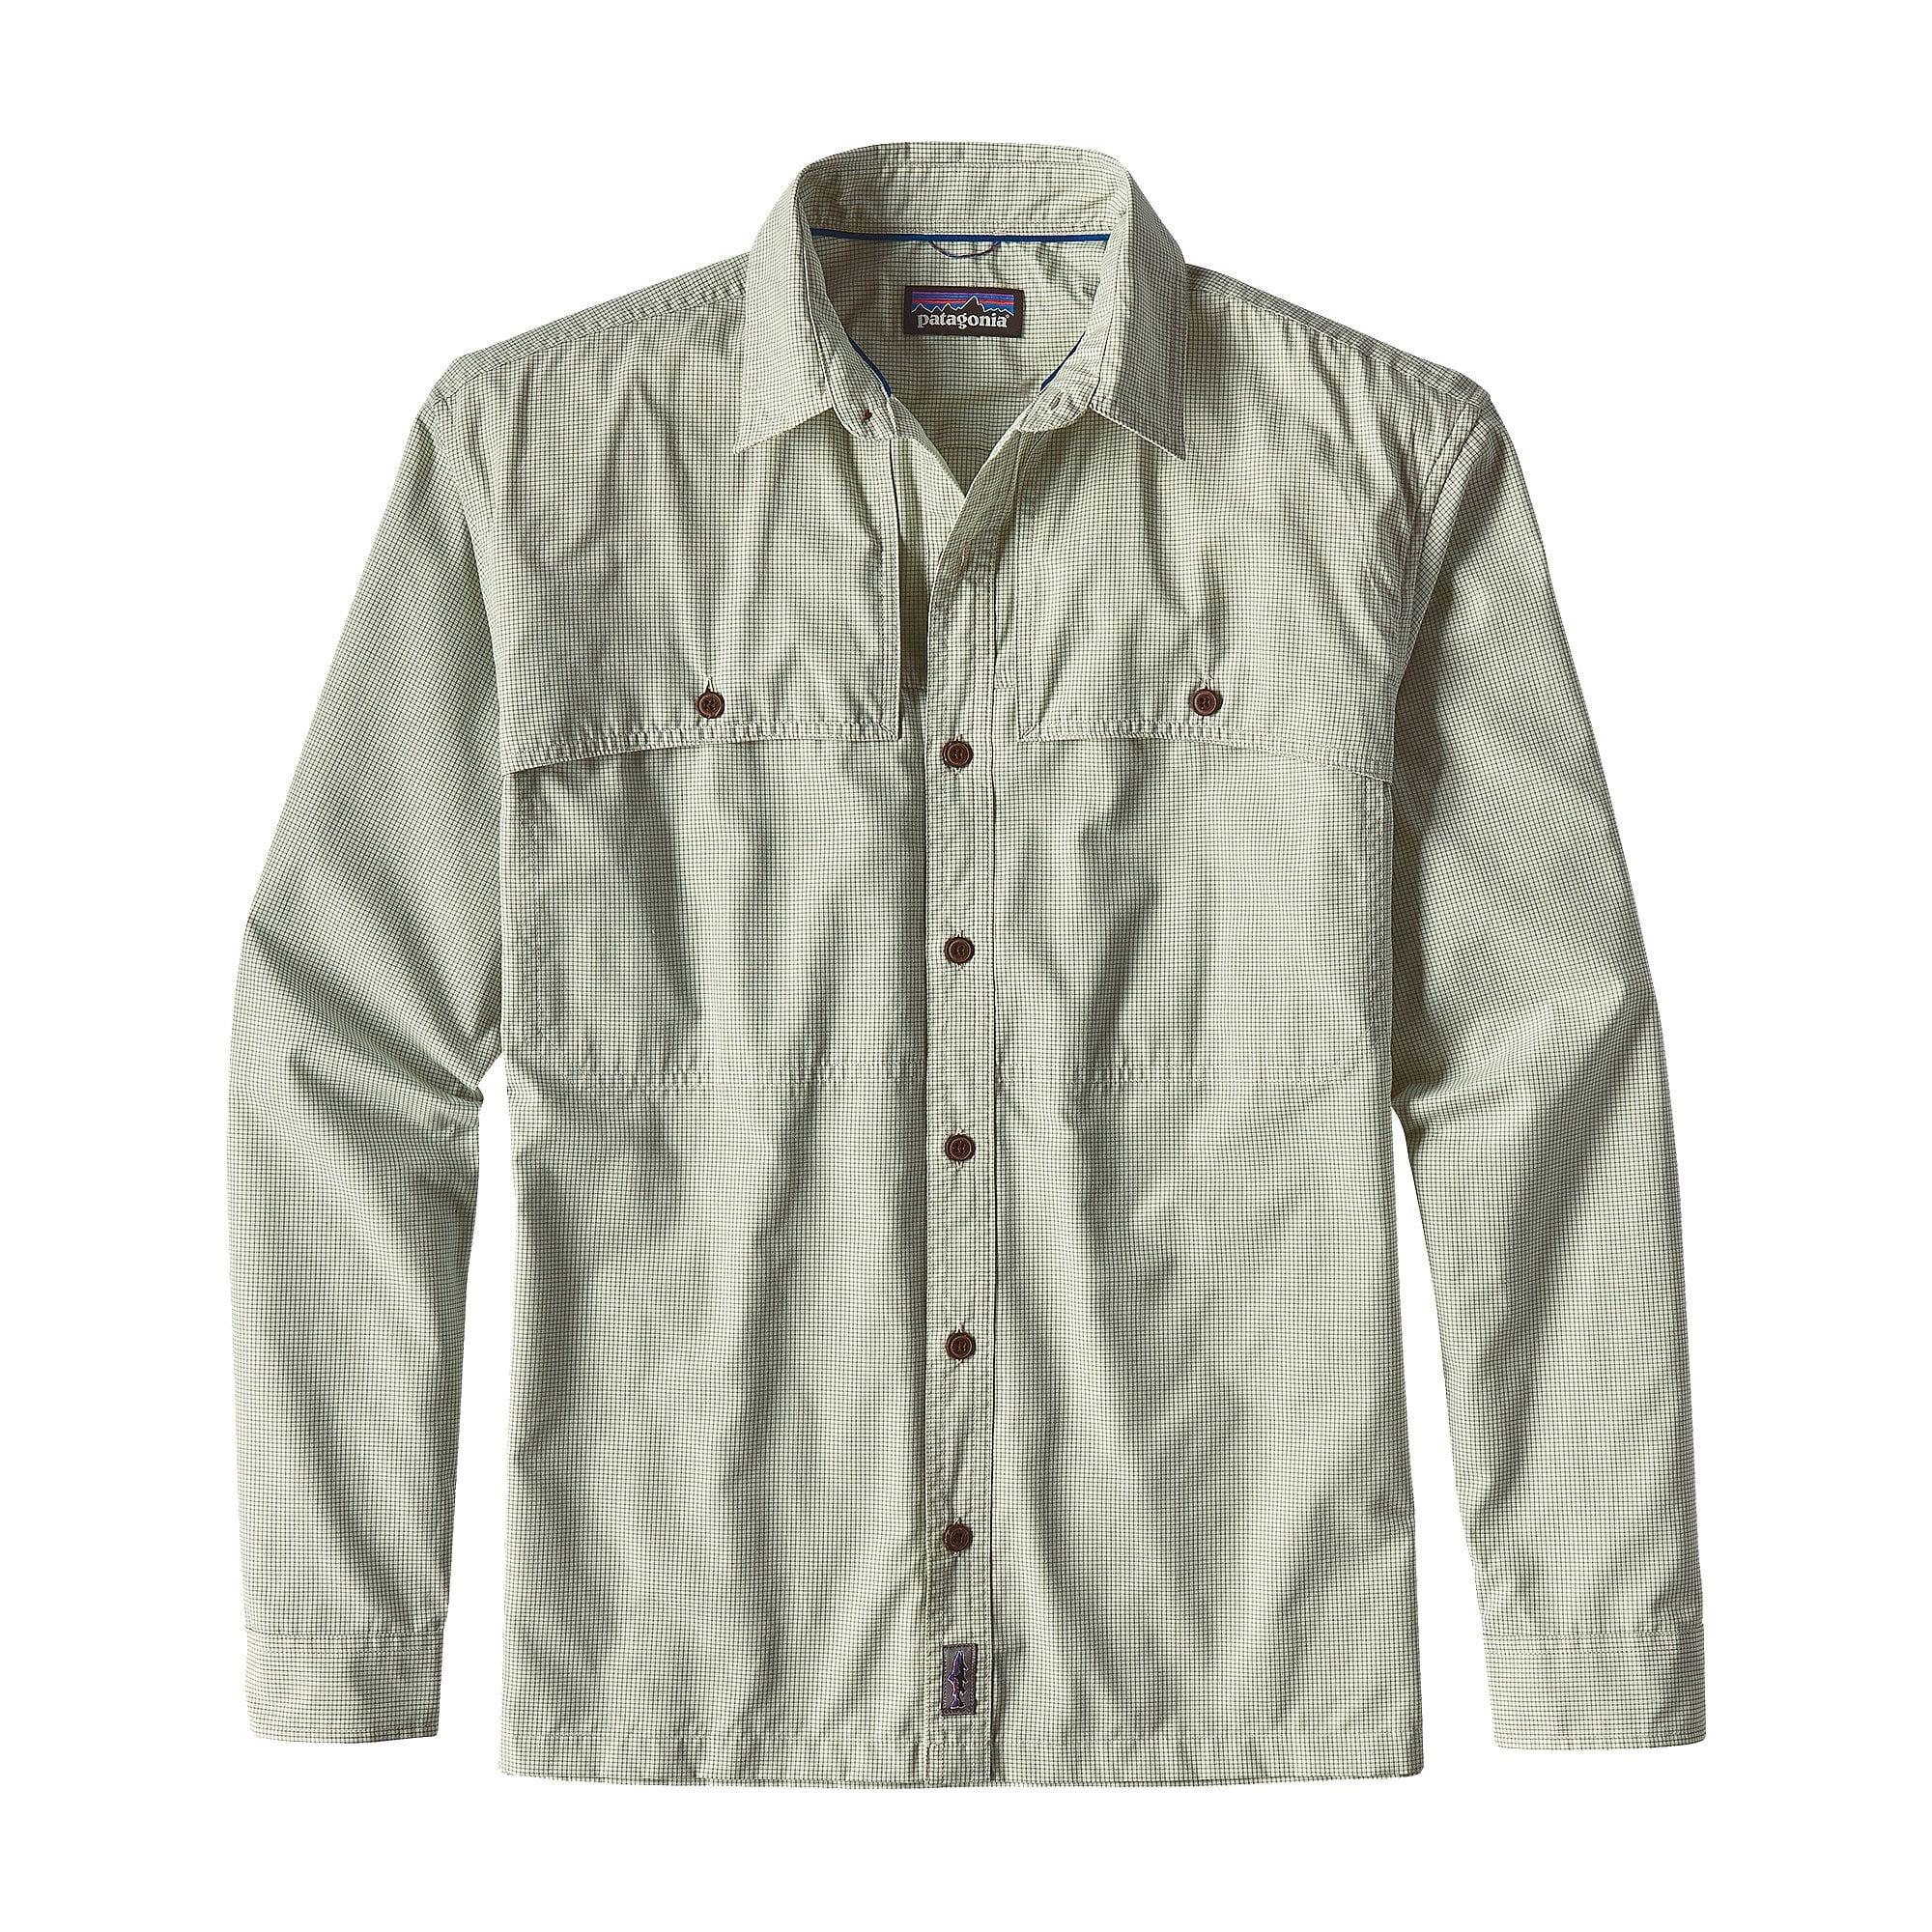 Patagonia Island Hopper II Shirt Gill Green